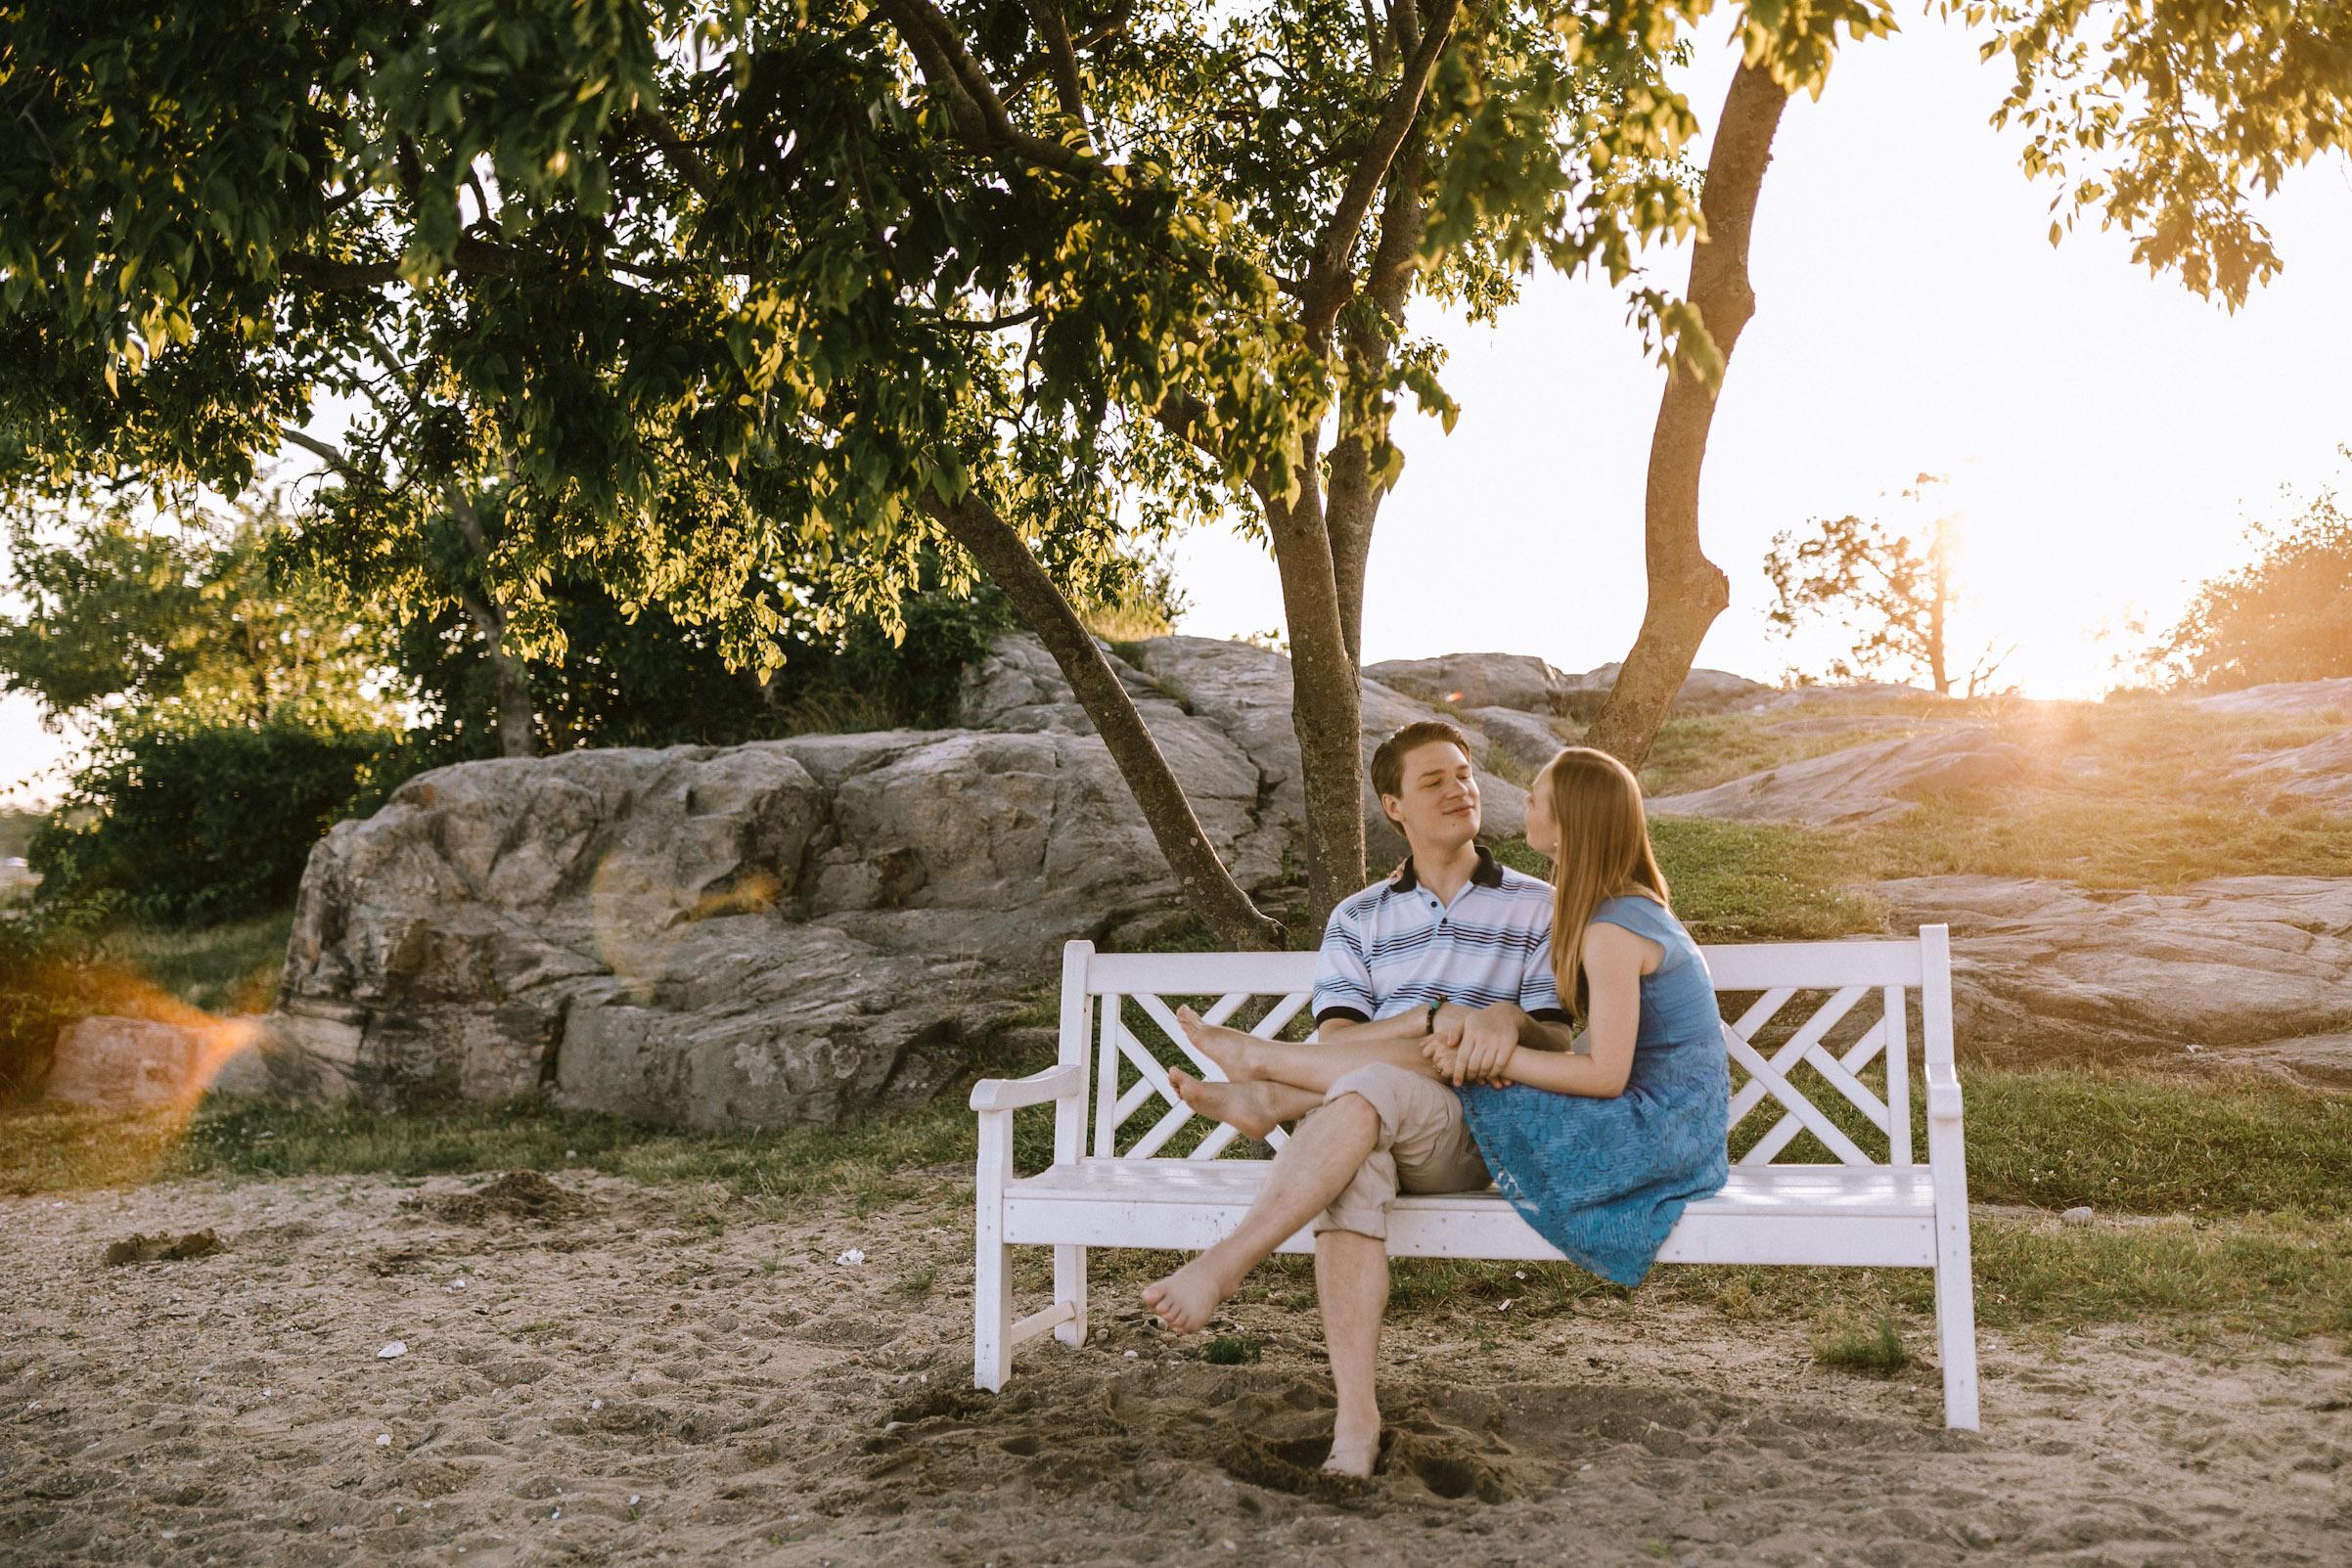 Siobhan-Michael-Engagement-27.jpg